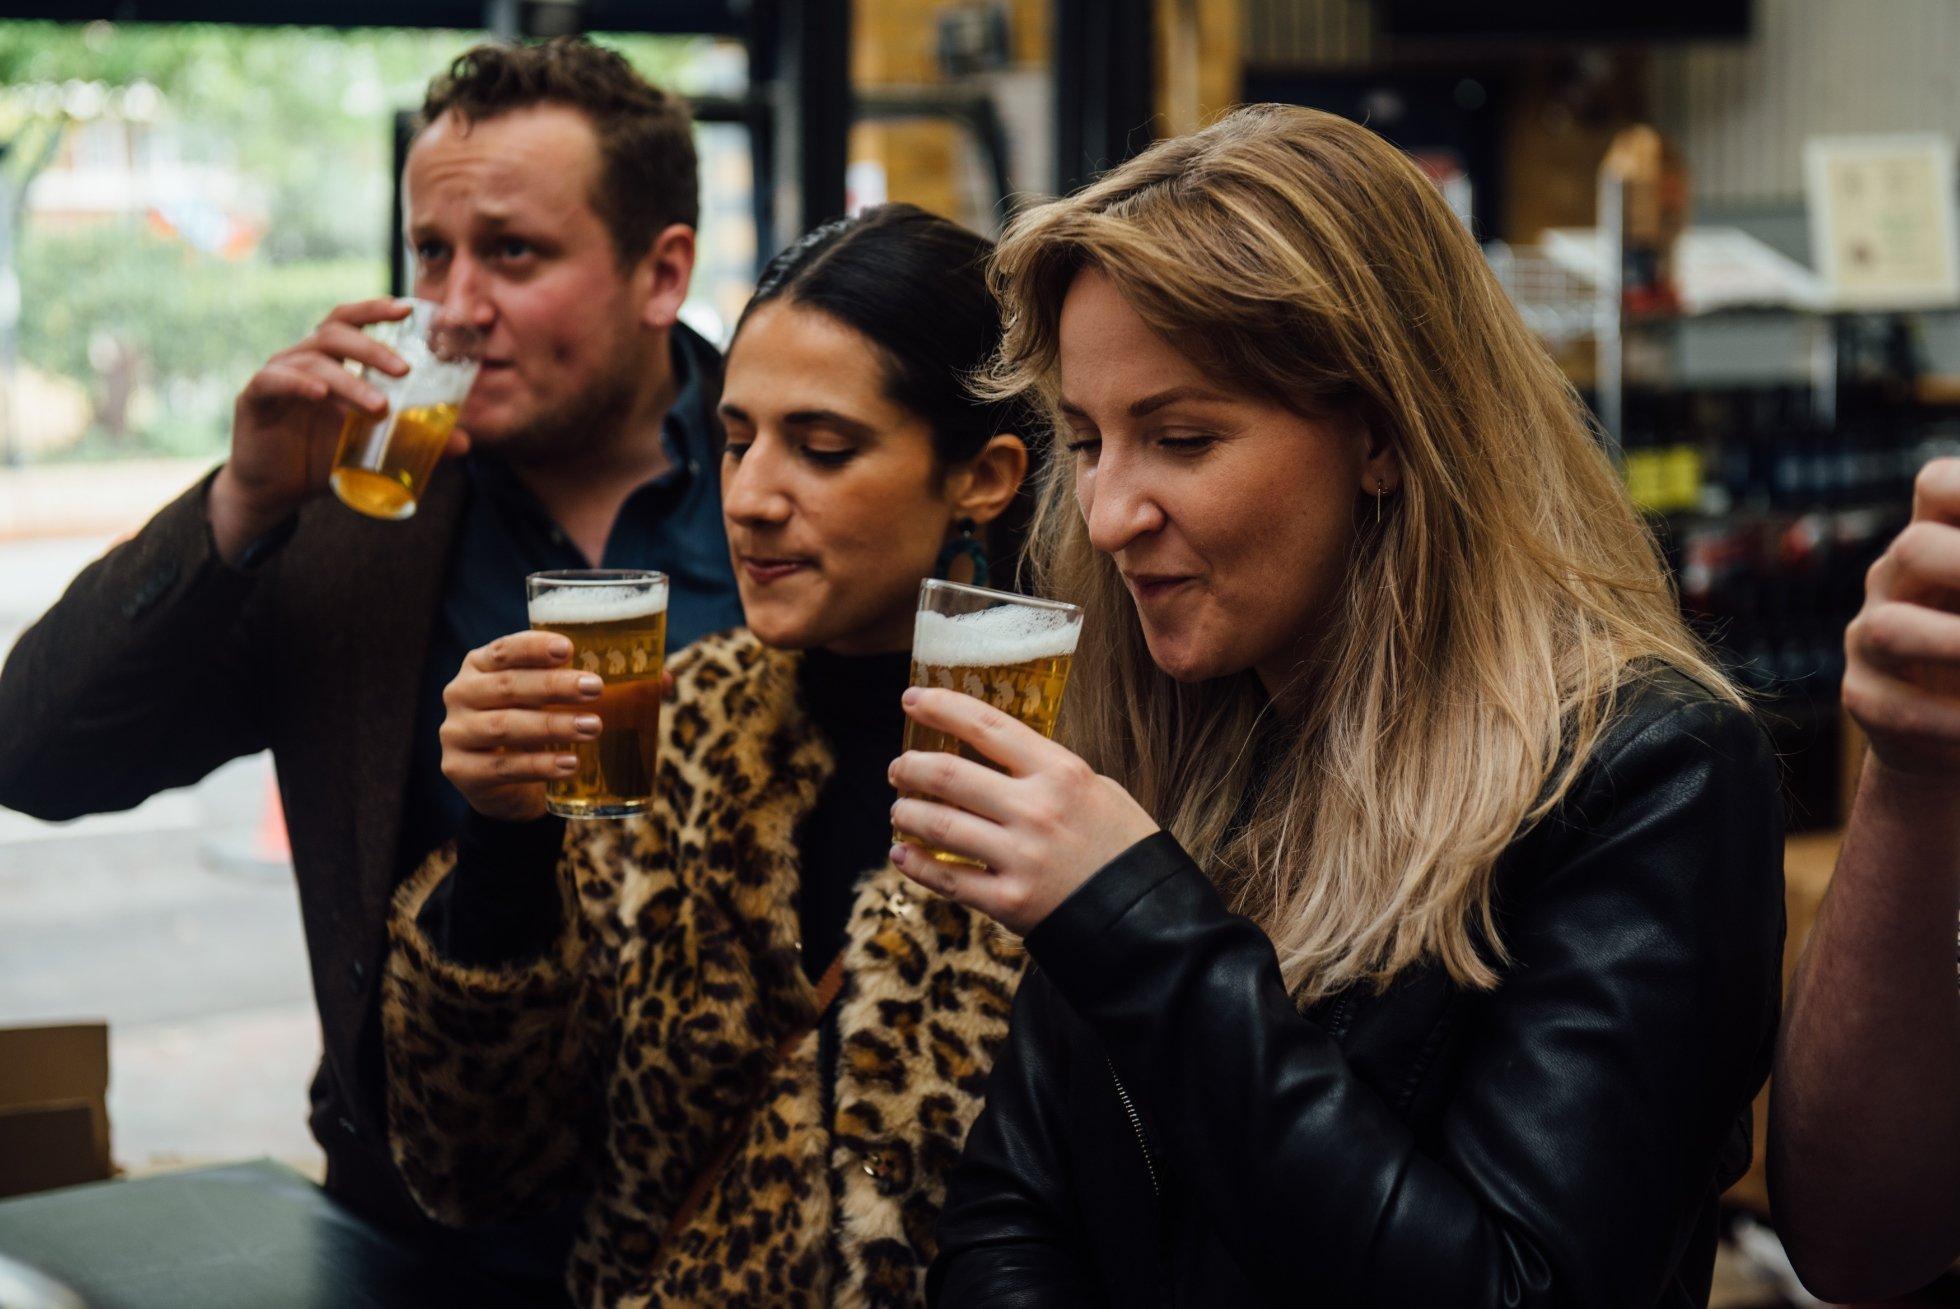 c-fakepath-england_london_southwark-brew